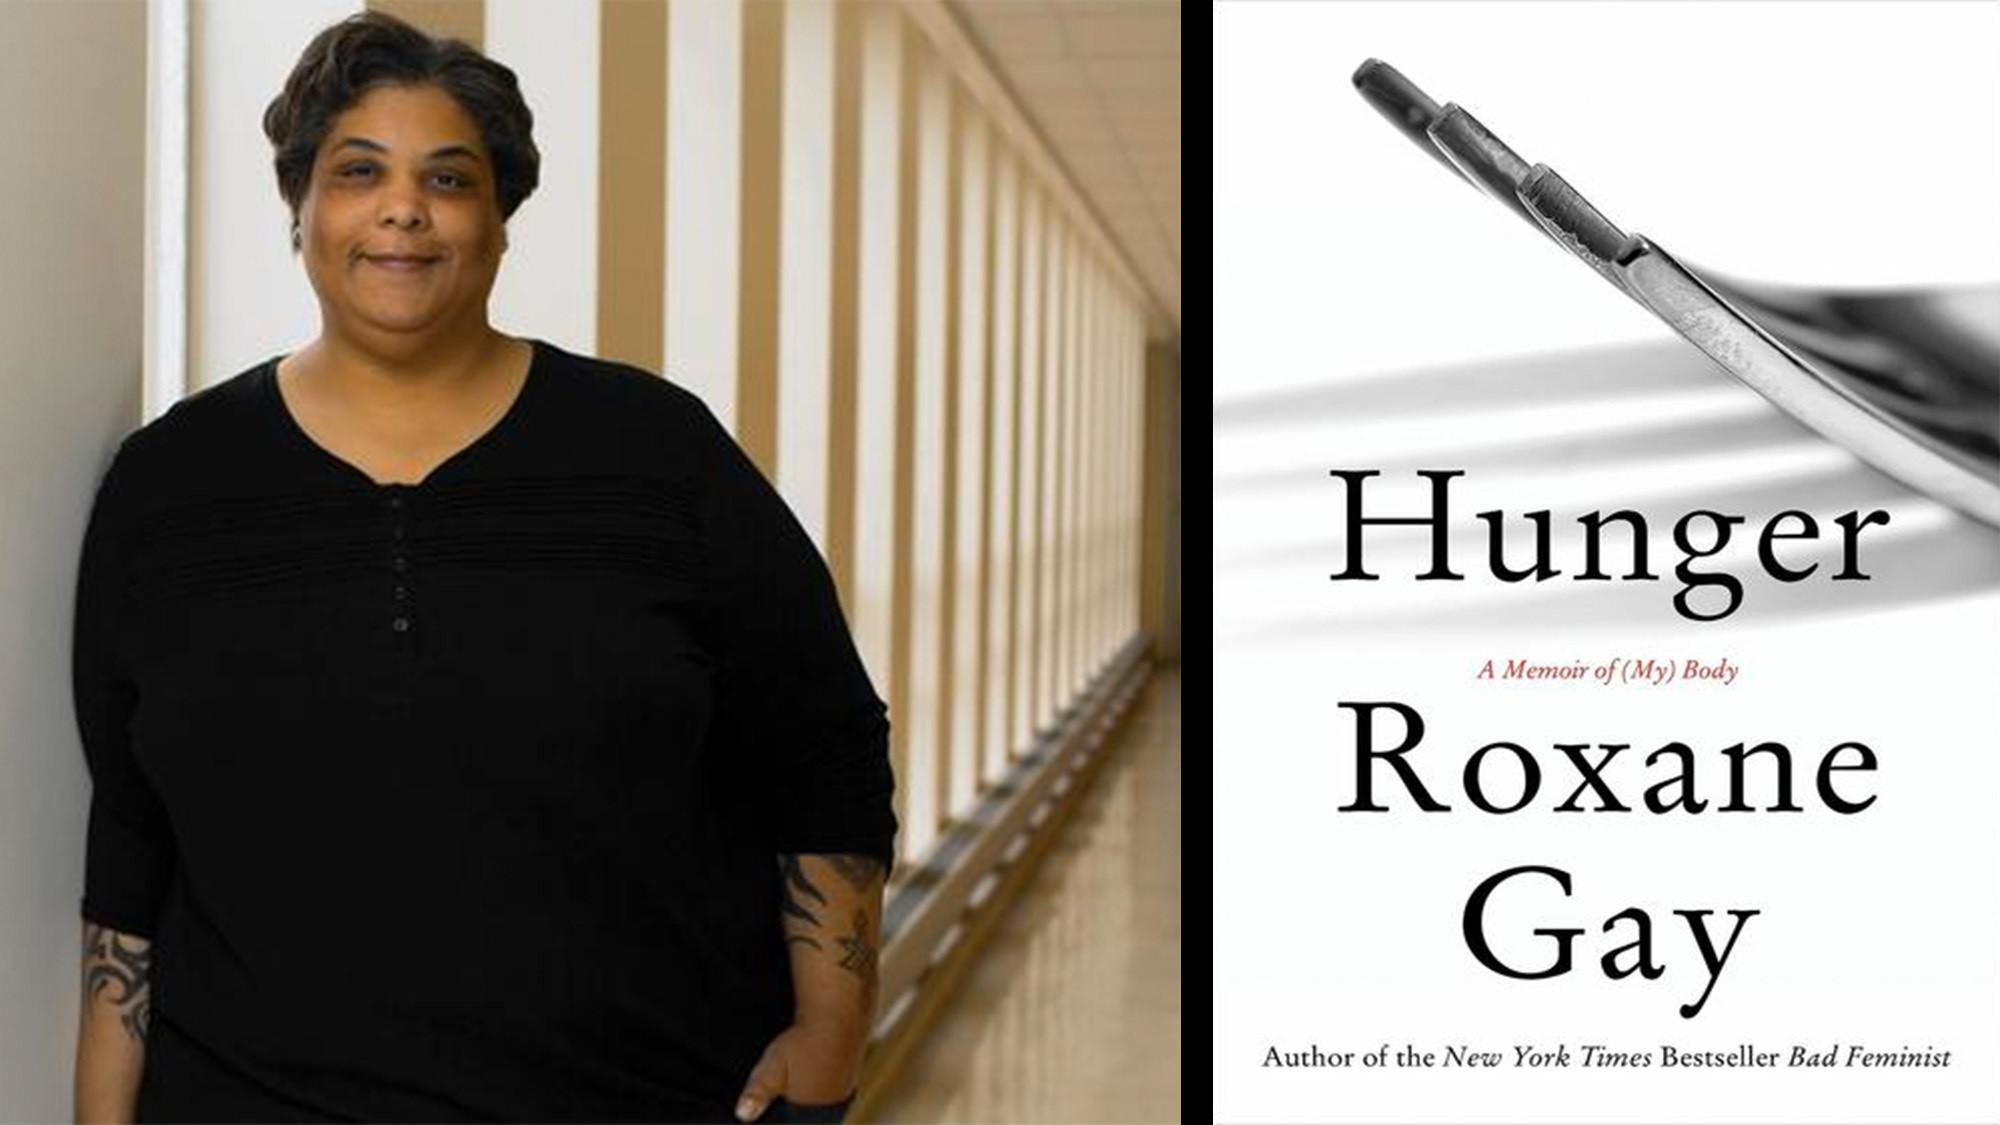 book, roxane gay, hunger